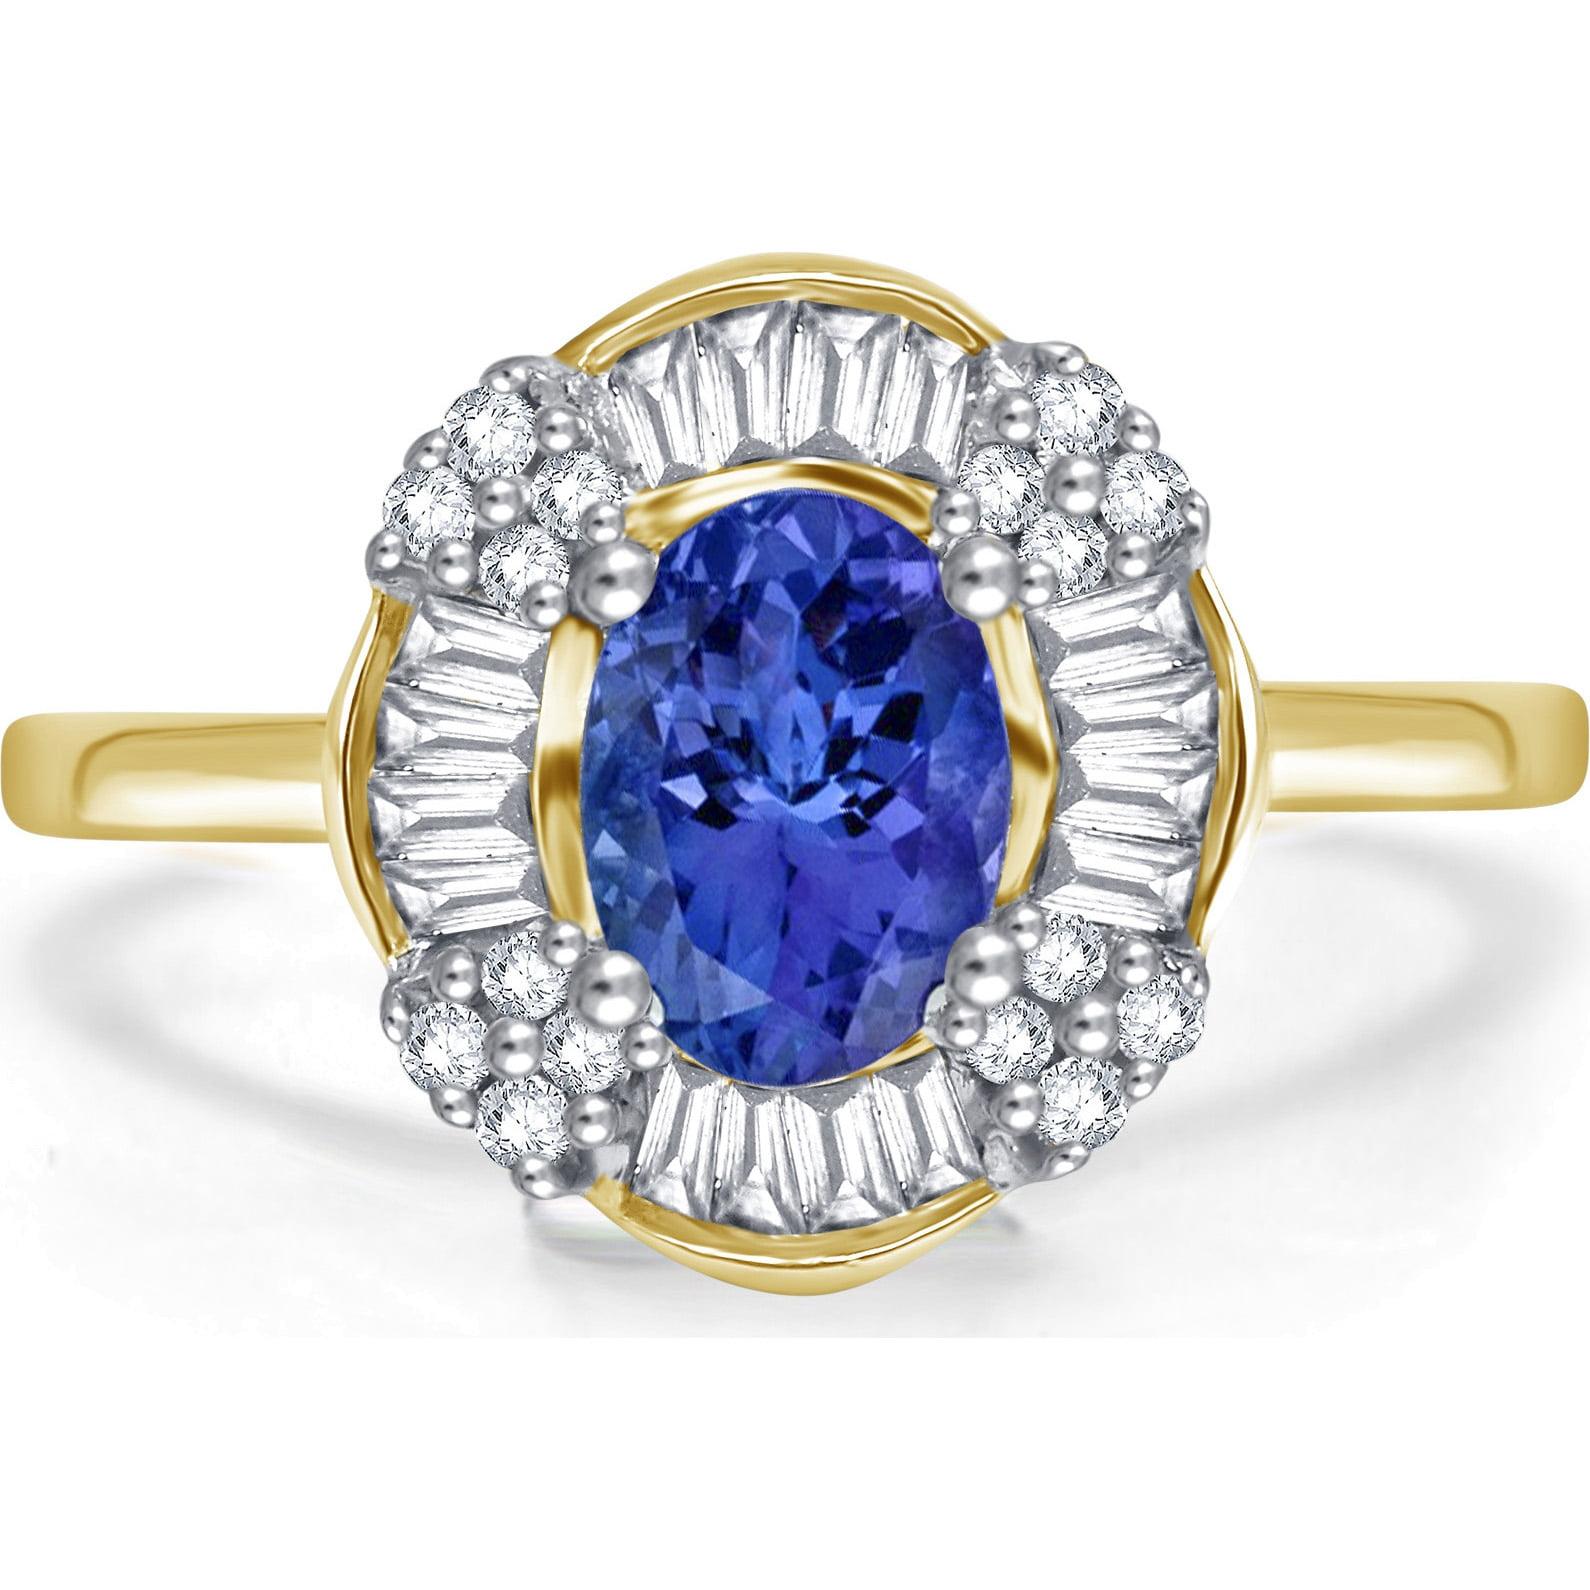 1 1 2 Carat T.W. Tanzanite and Diamond 14K Yellow Gold Ring by Generic